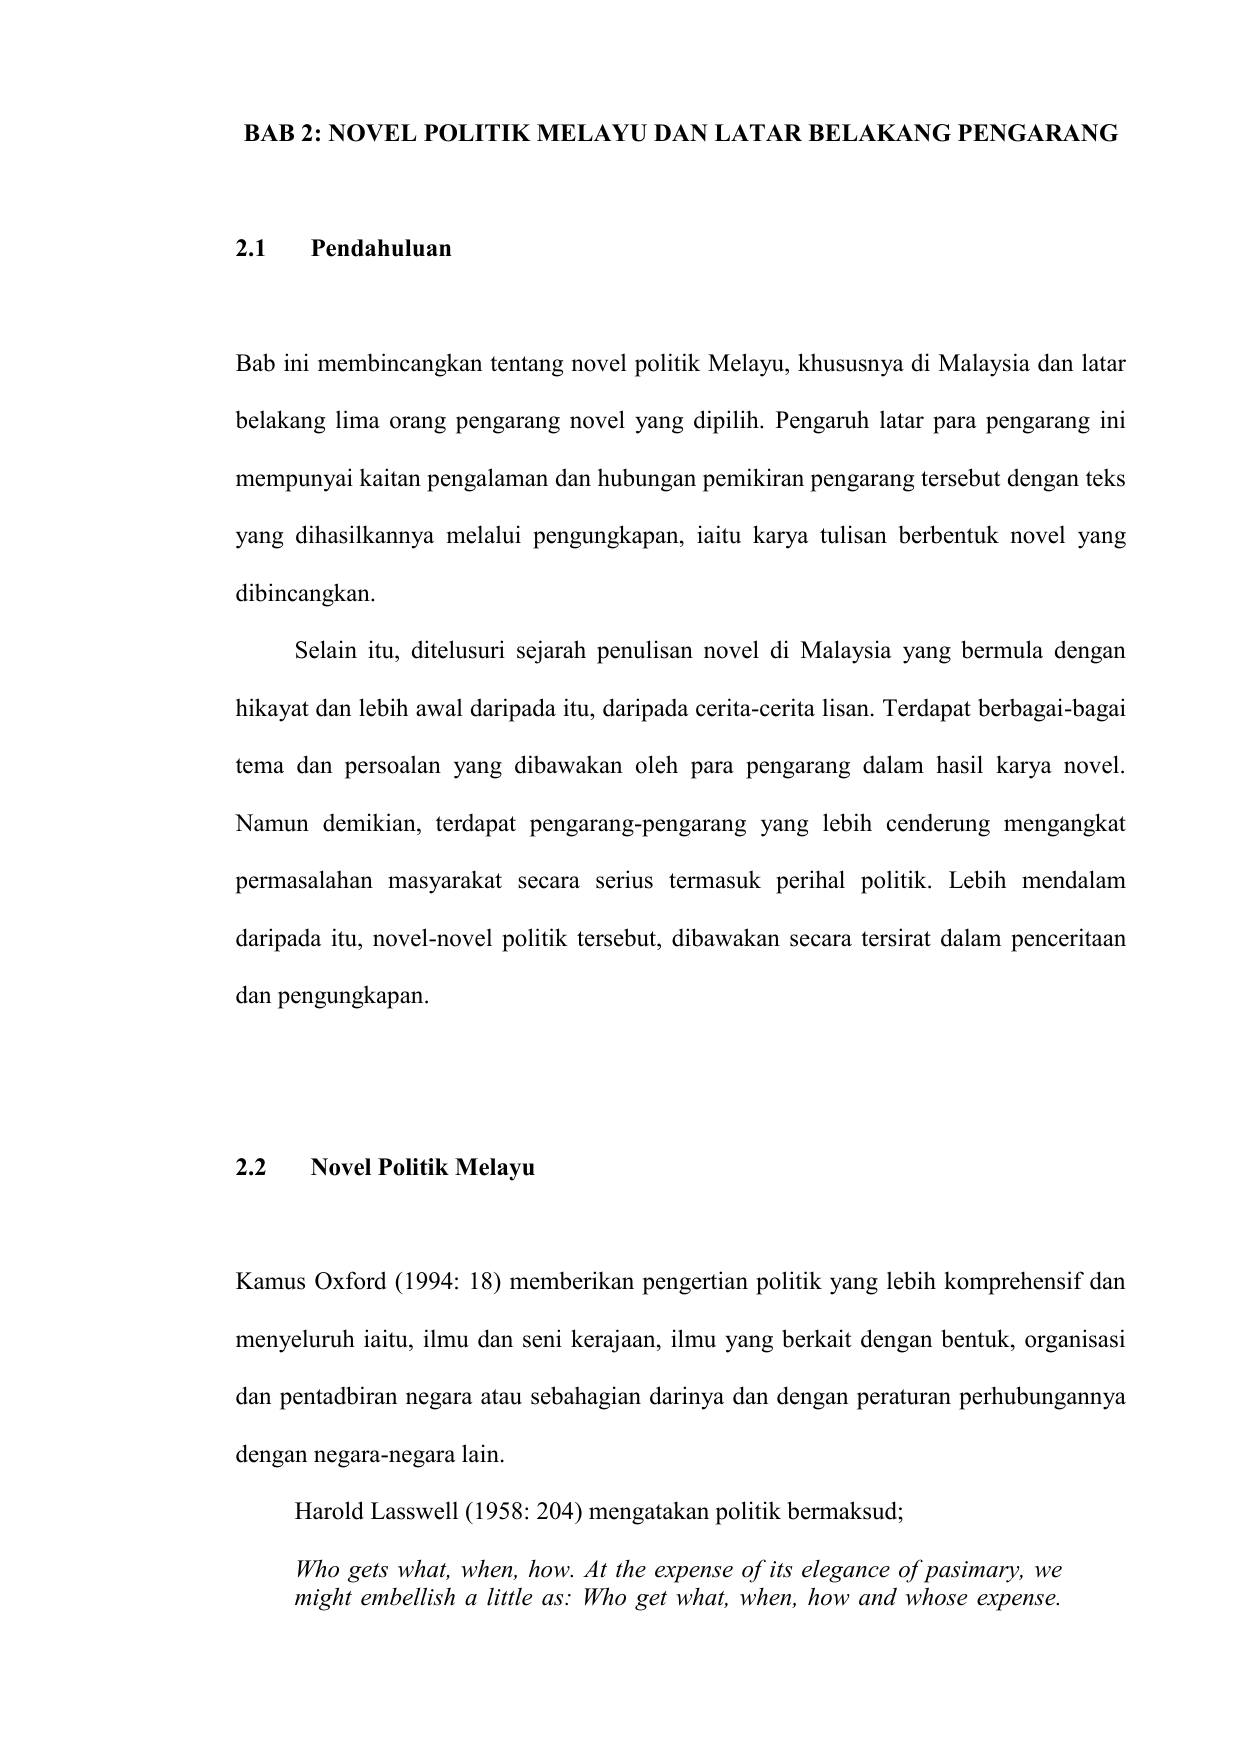 Bab 2 Novel Politik Melayu Dan Latar Belakang